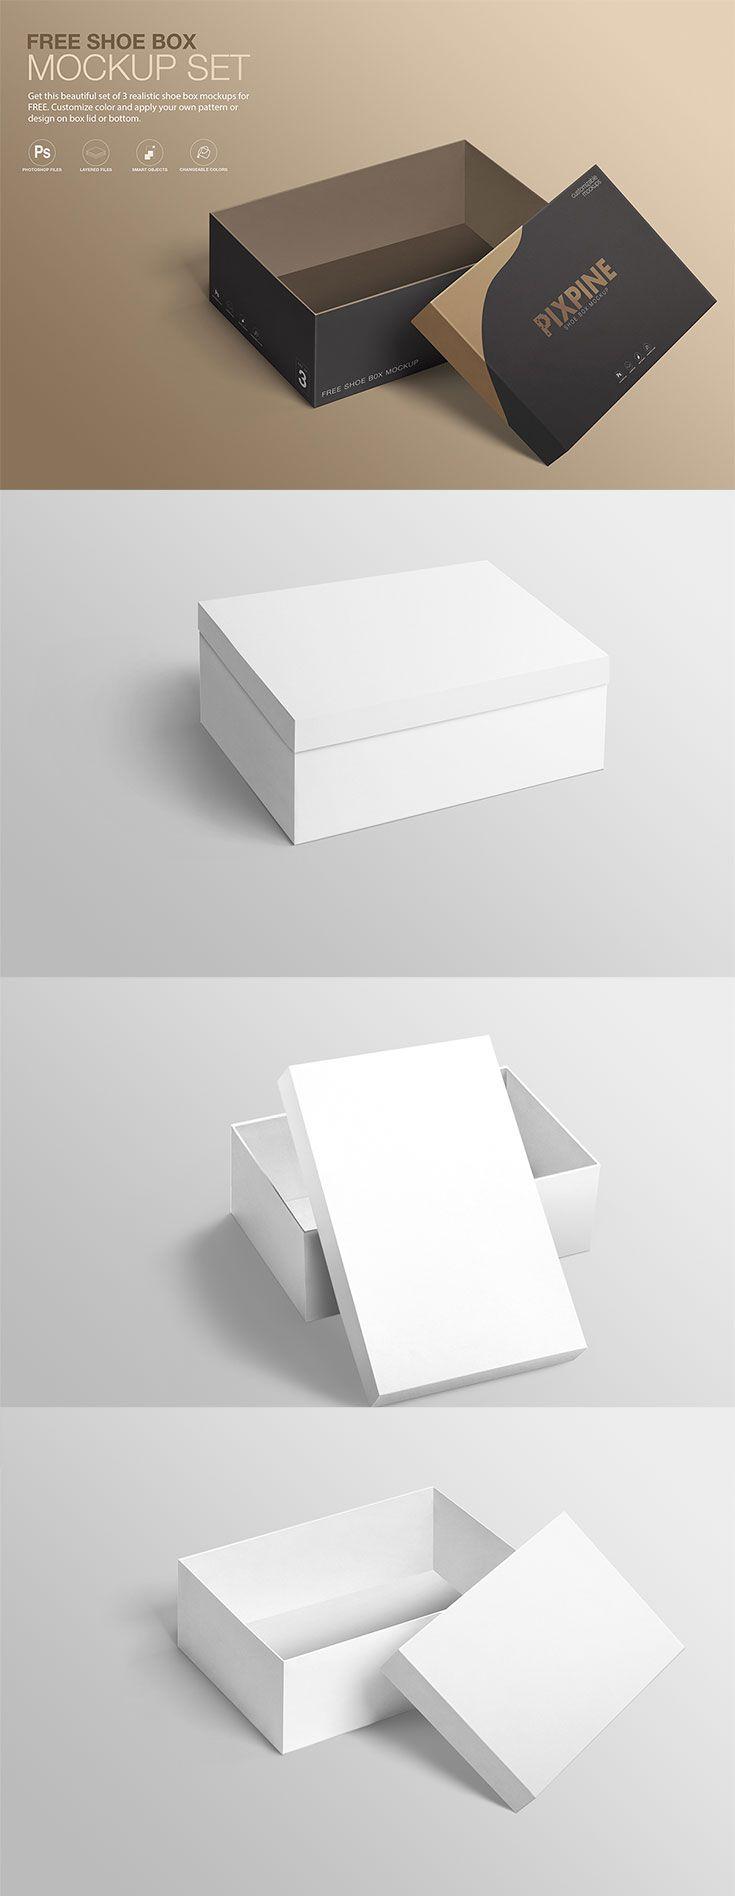 Download Free Shoe Box Mockup Set Shoe Box Design Logo Design Mockup Box Mockup